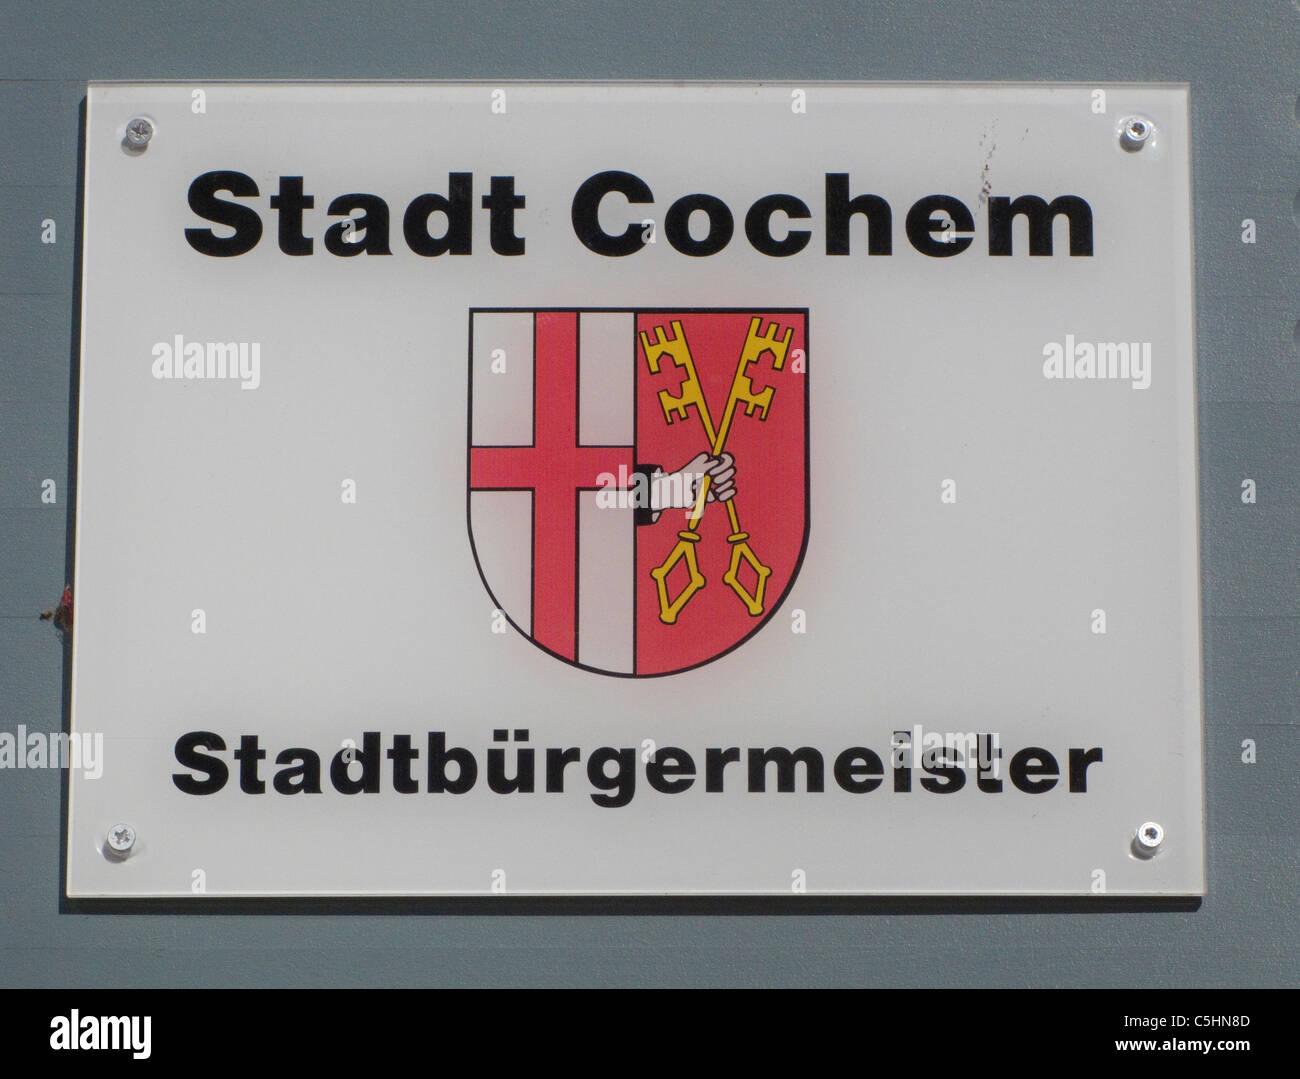 Eingangsschild, Hausschild, Stadtbuergermeister, Rathaus am Marktplatz, Board, sign of the town hall, market place, - Stock Image